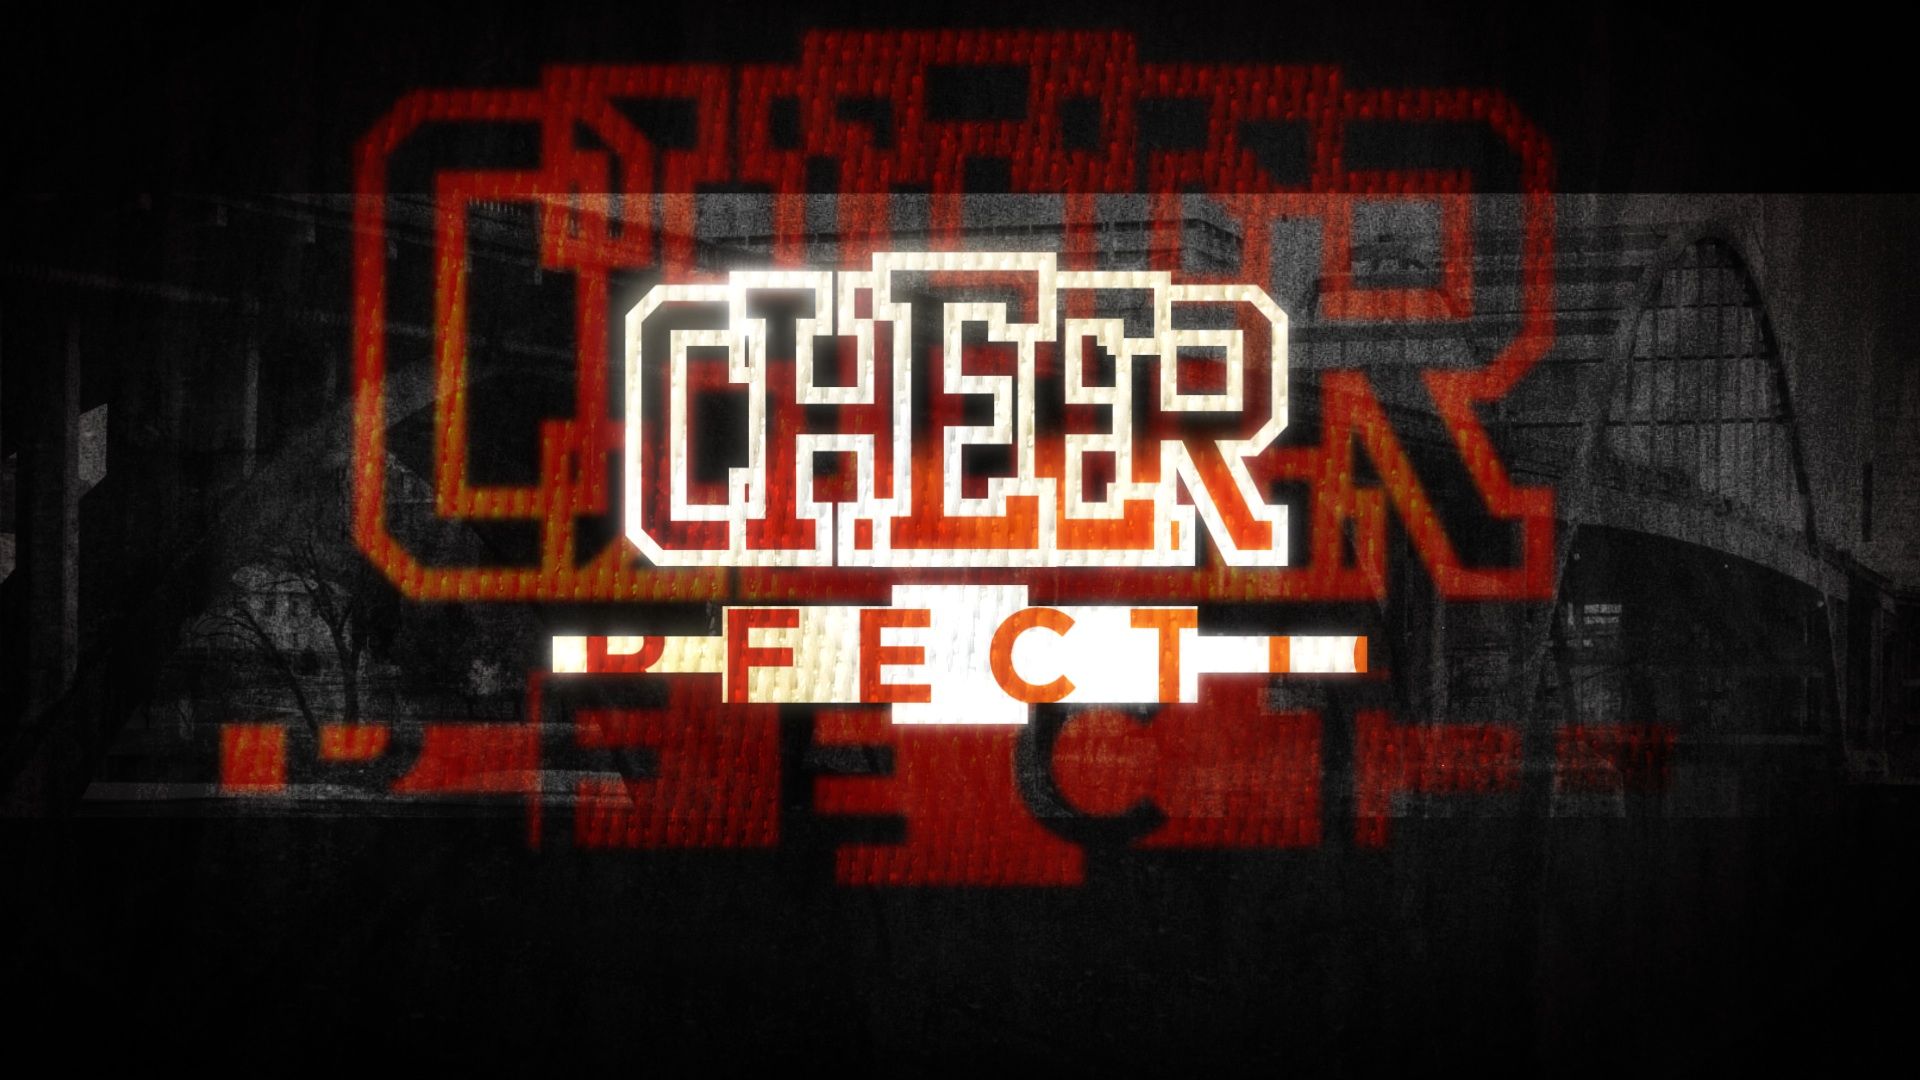 morion graphic design studio jonberrydesign   Cheer Perfection